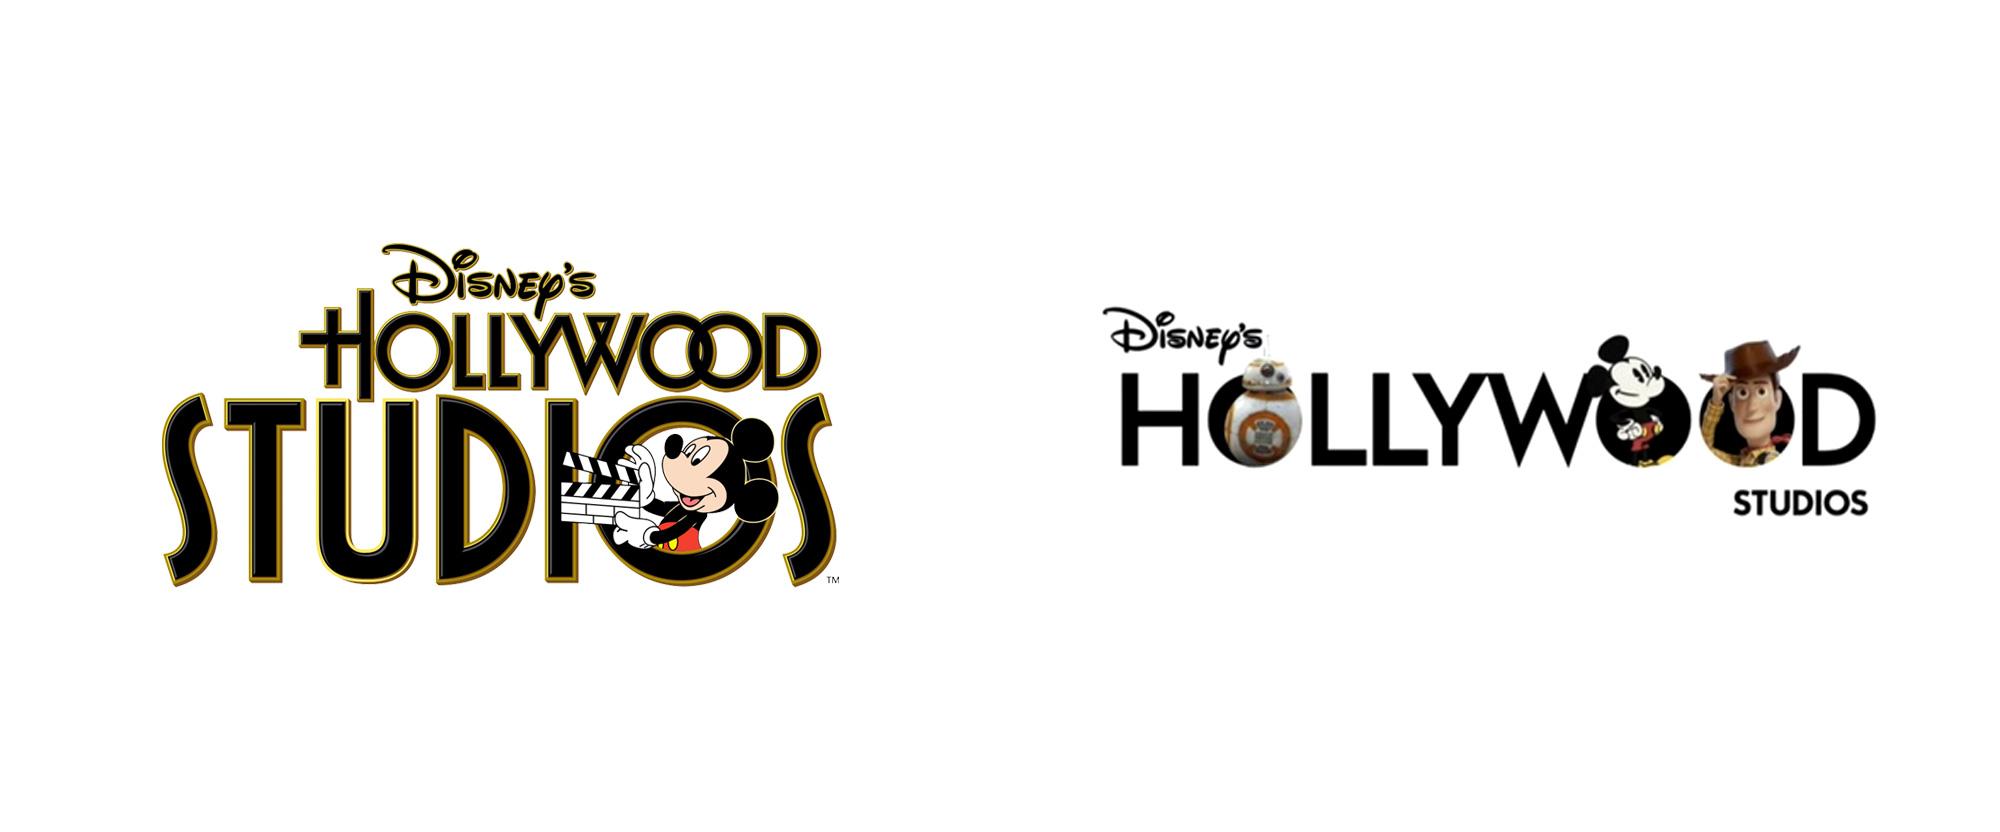 New Logo for Disney's Hollywood Studios